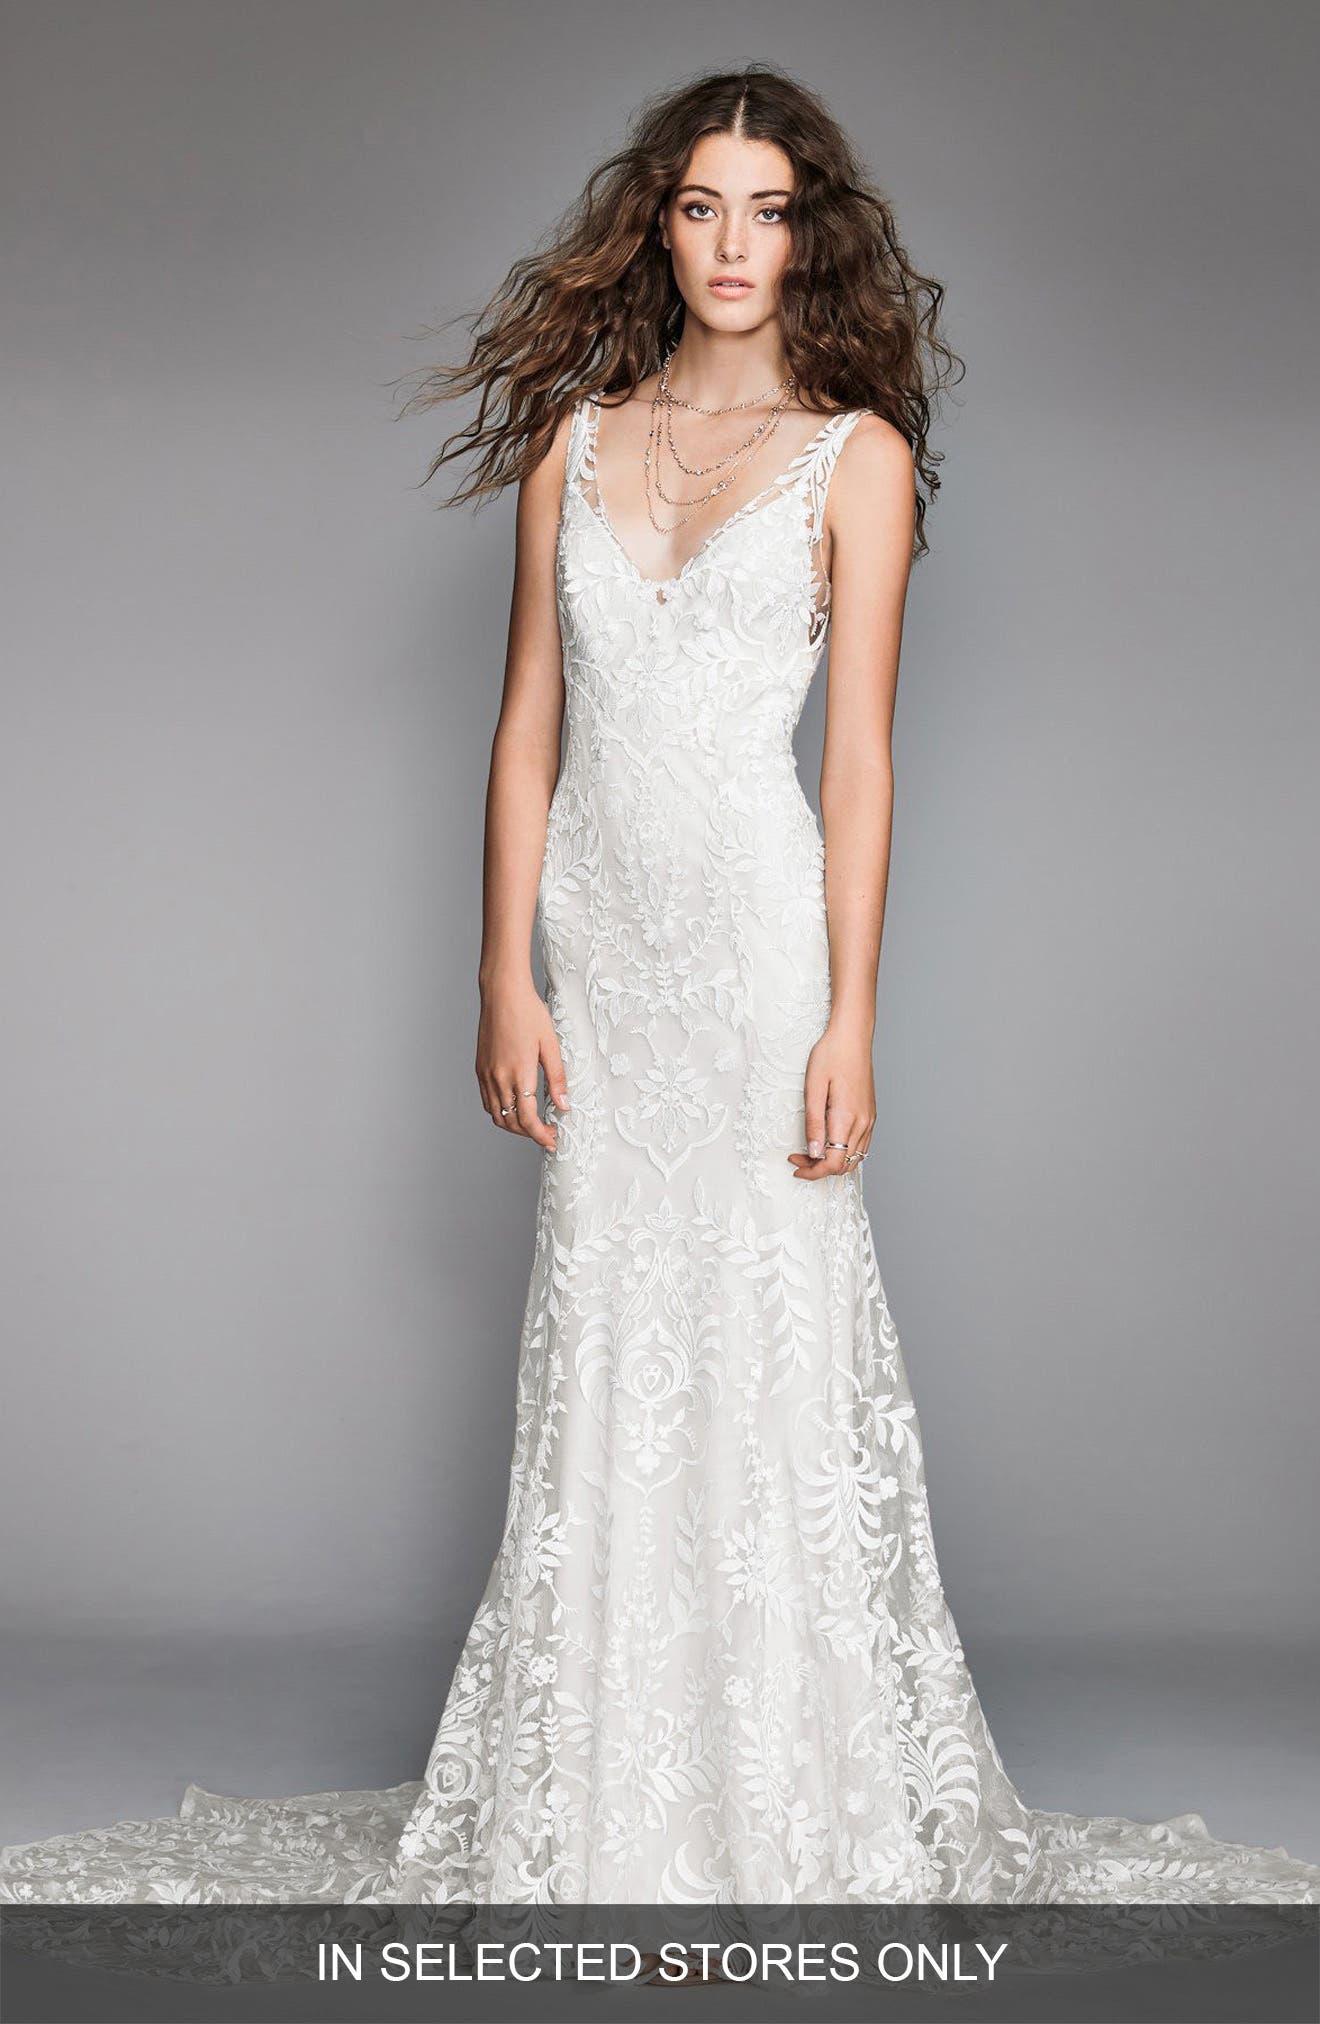 Lace White Formal Dress